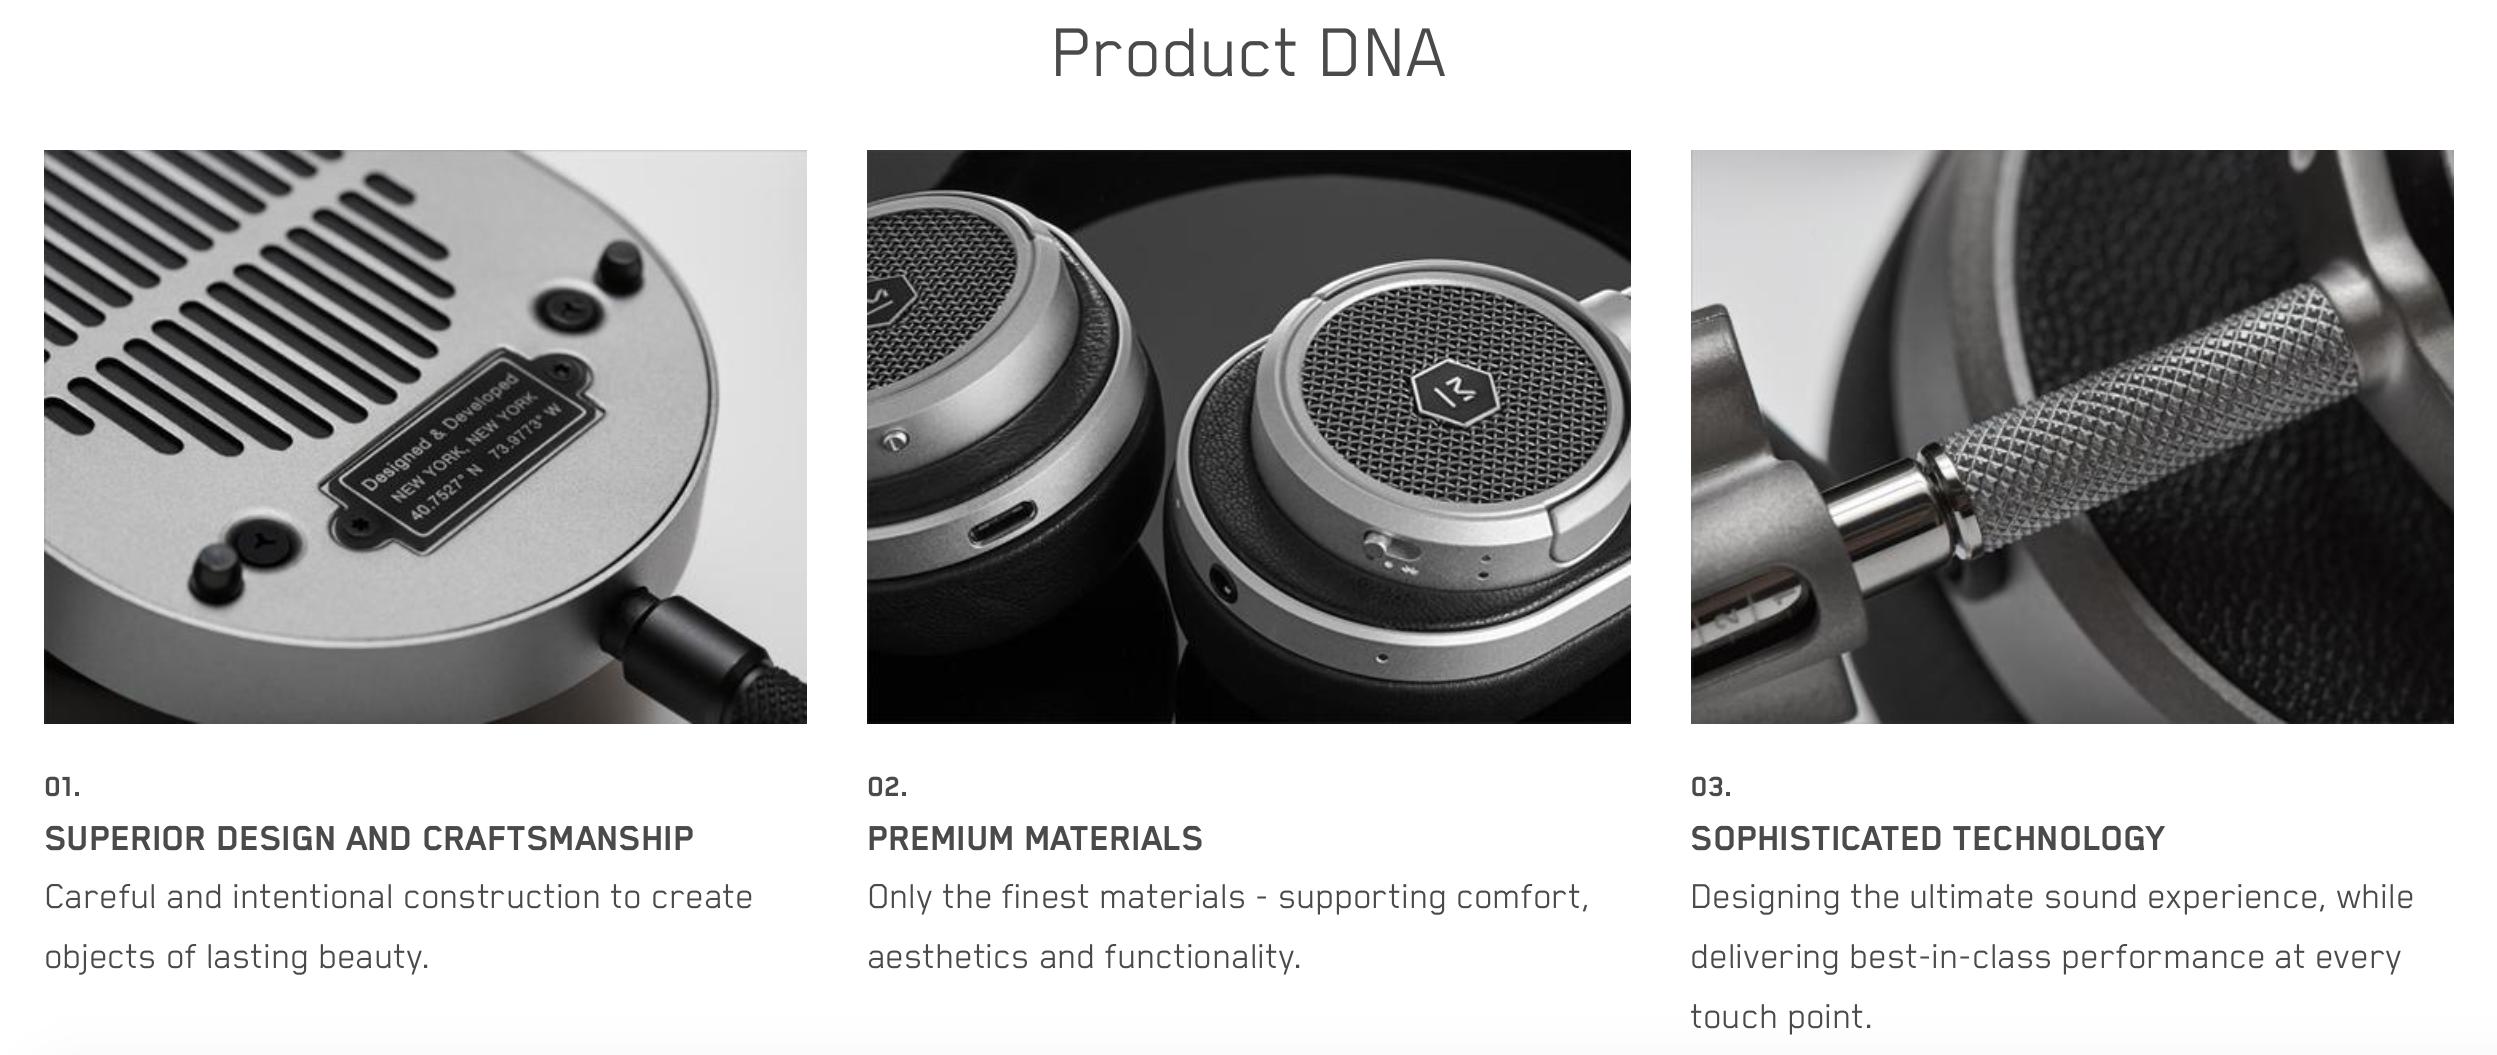 Master & Dynamic Product Descriptions